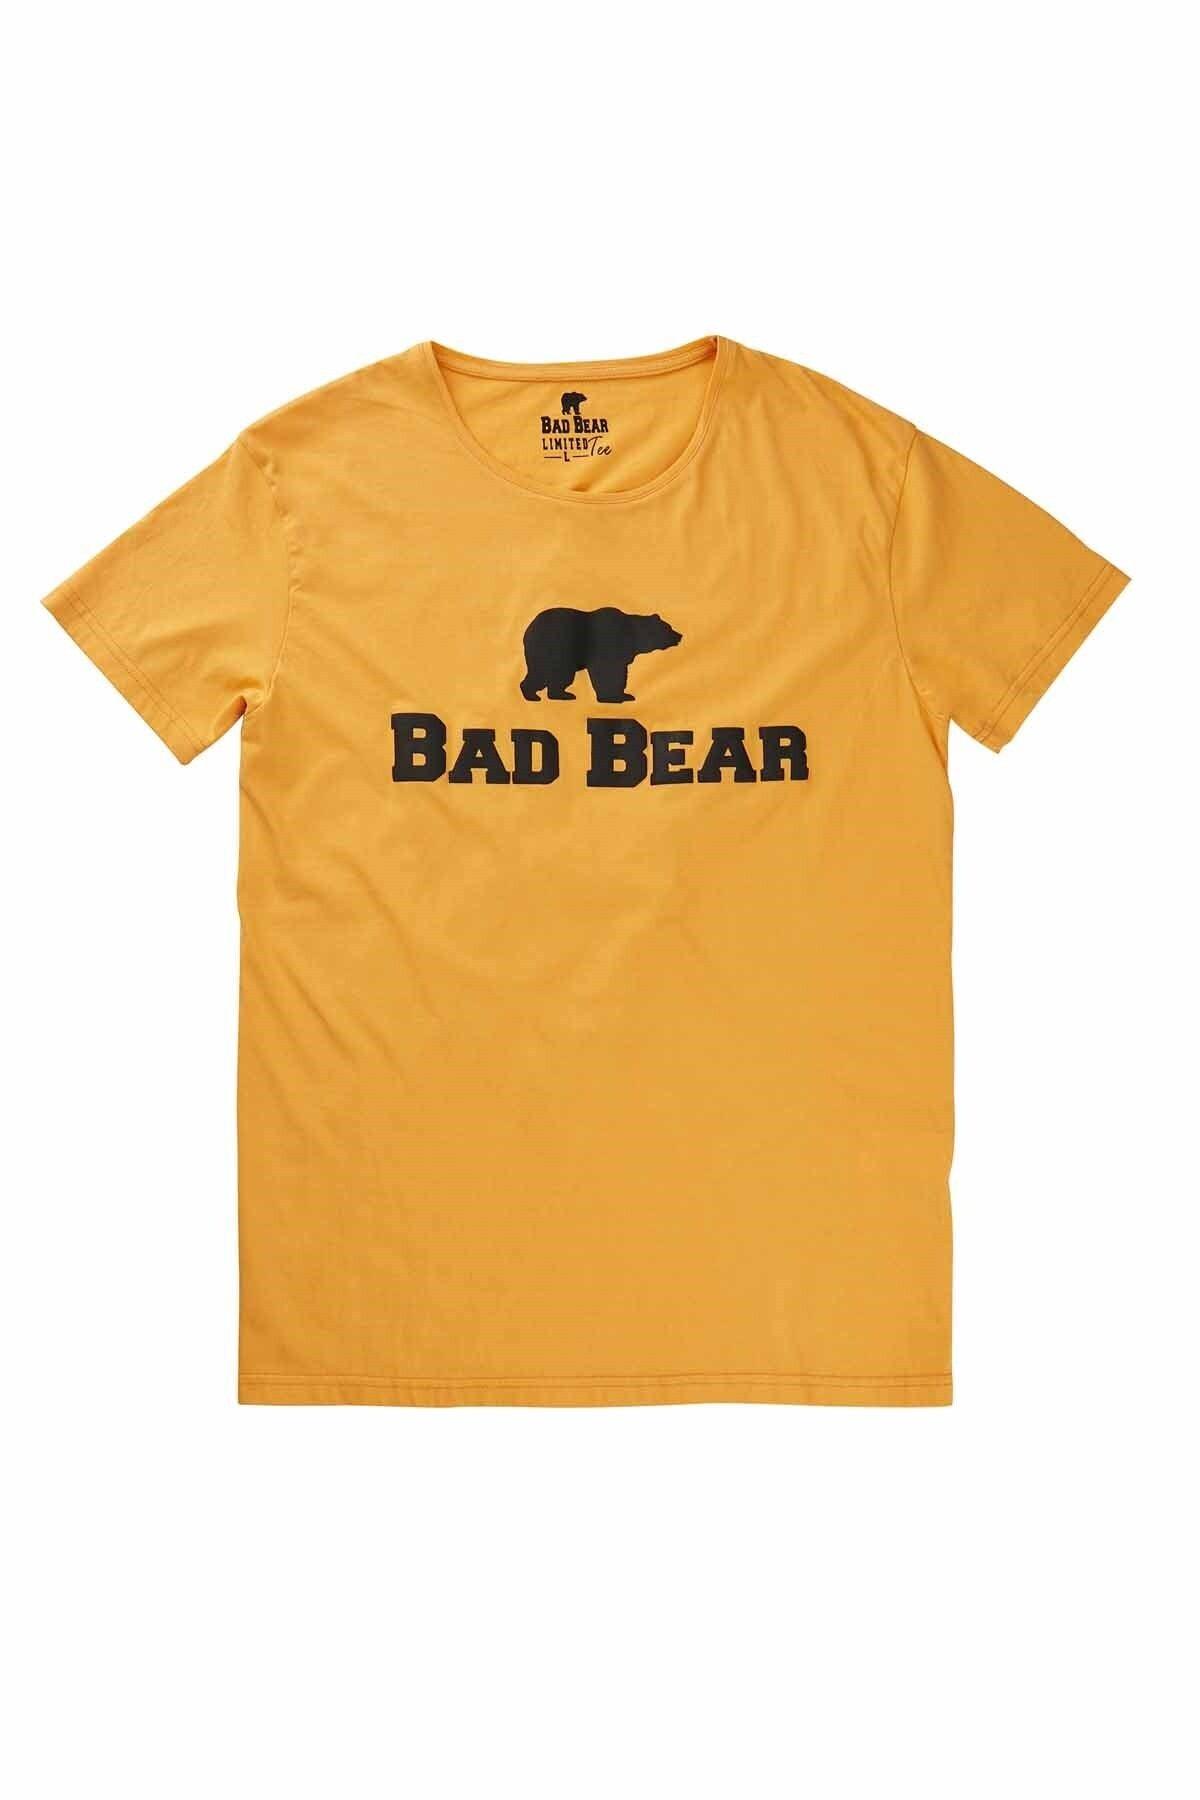 Bad Bear Tee Erkek Tişört 19.01.07.002mustard 1